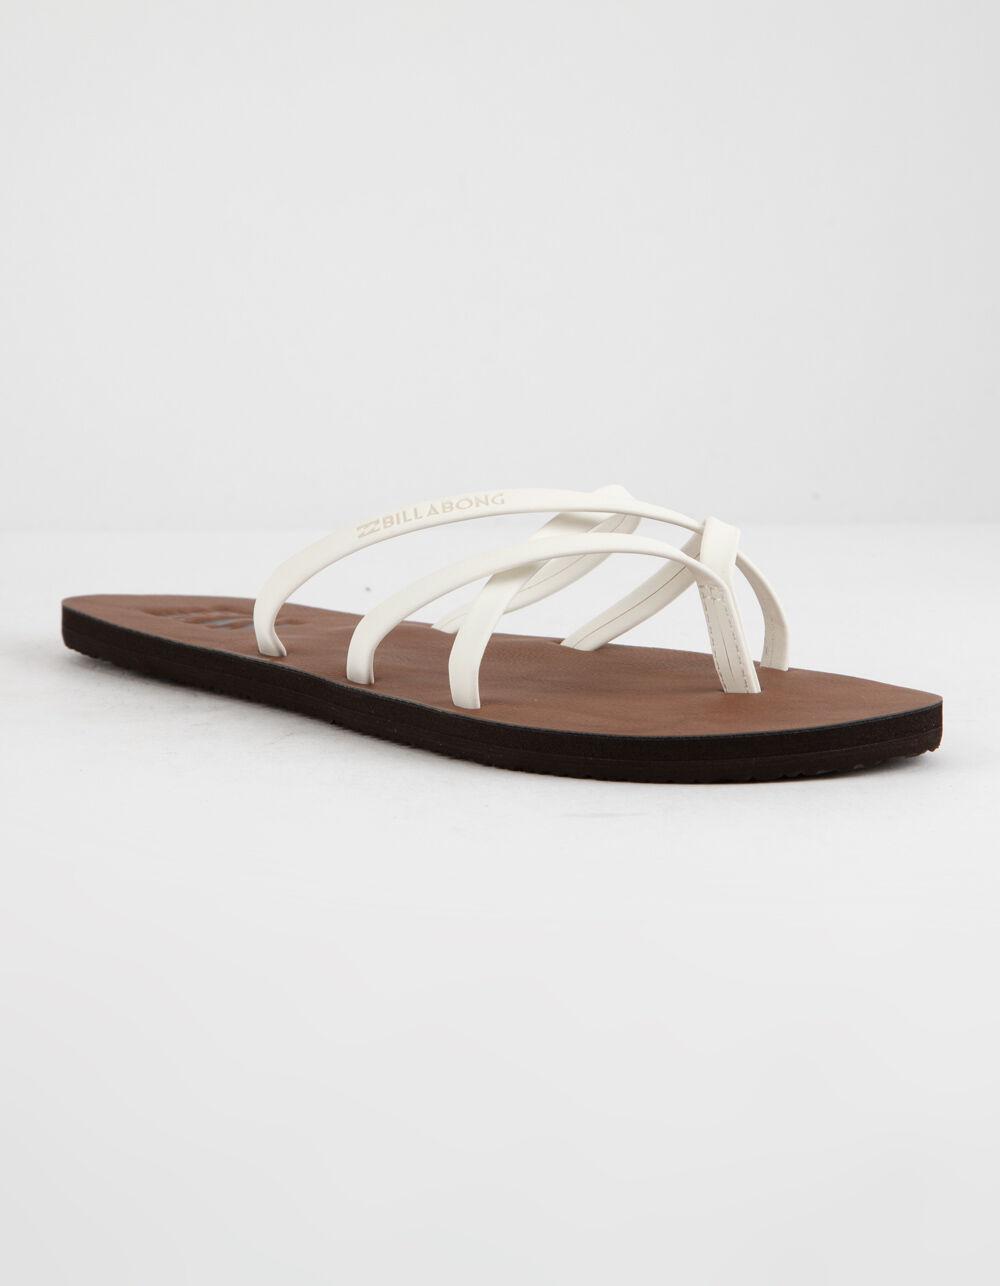 BILLABONG Paradise Cove White Sandals